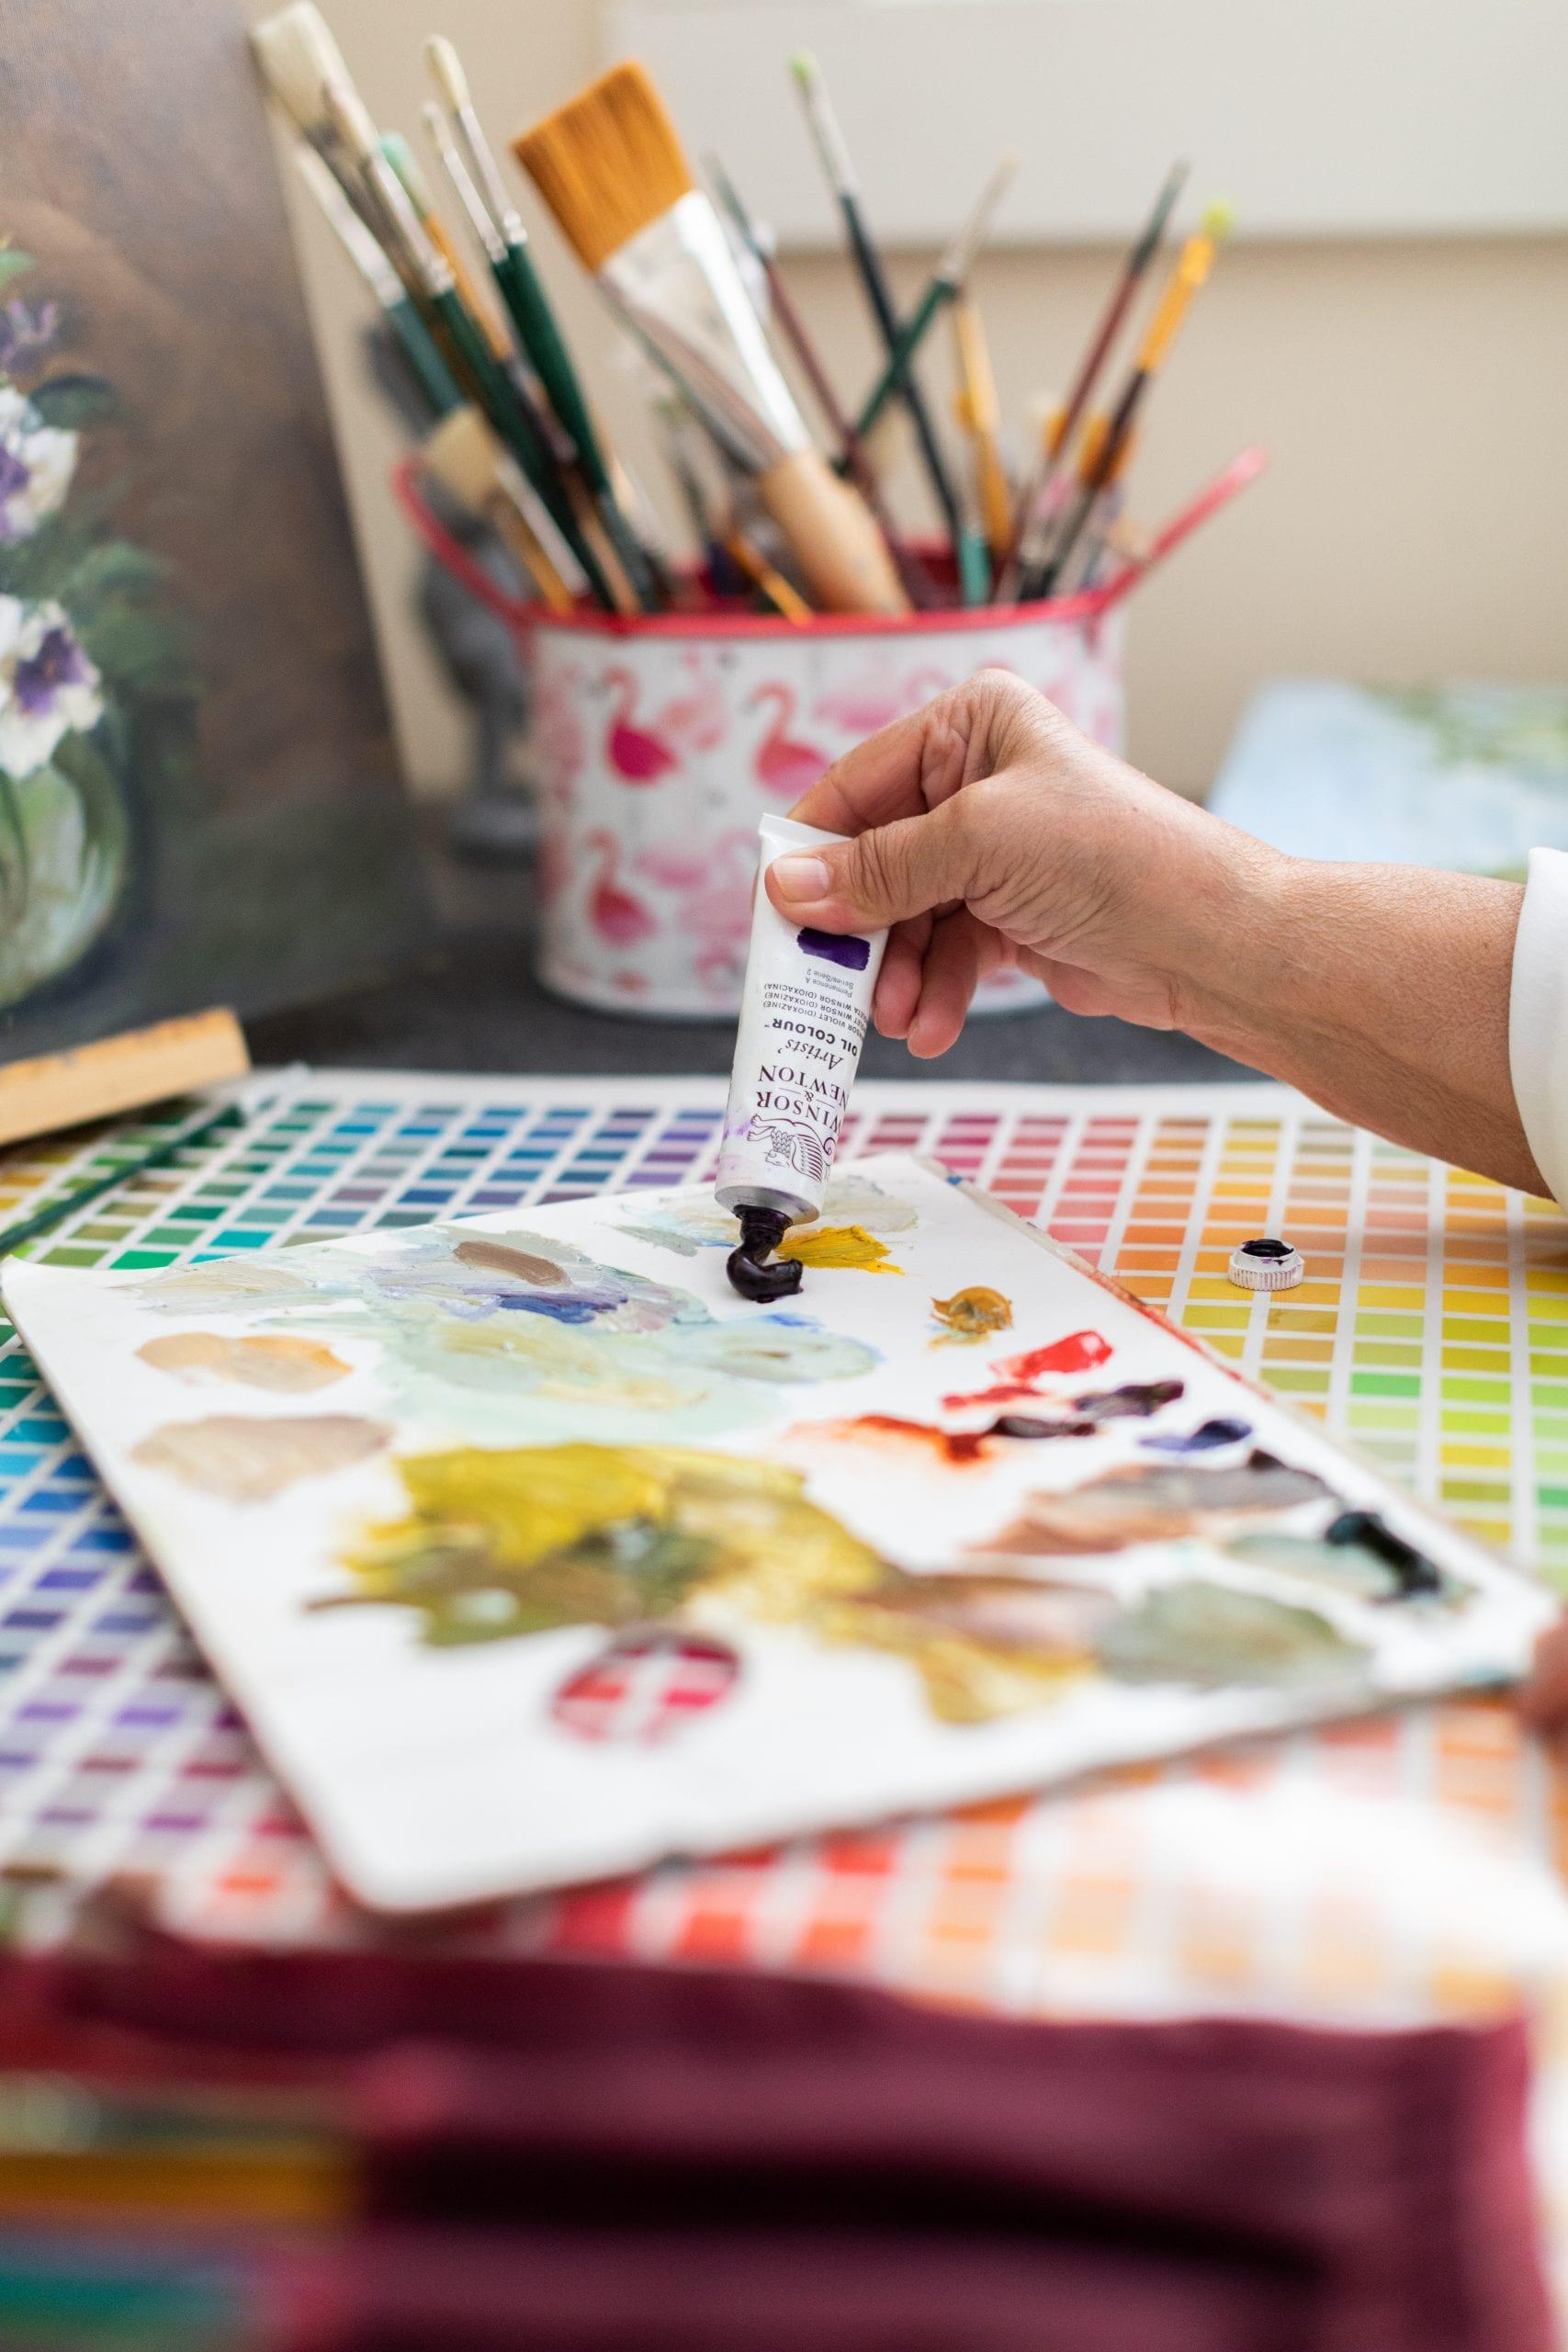 Peggy Harris applying dark purple oil paint to her painting palette.